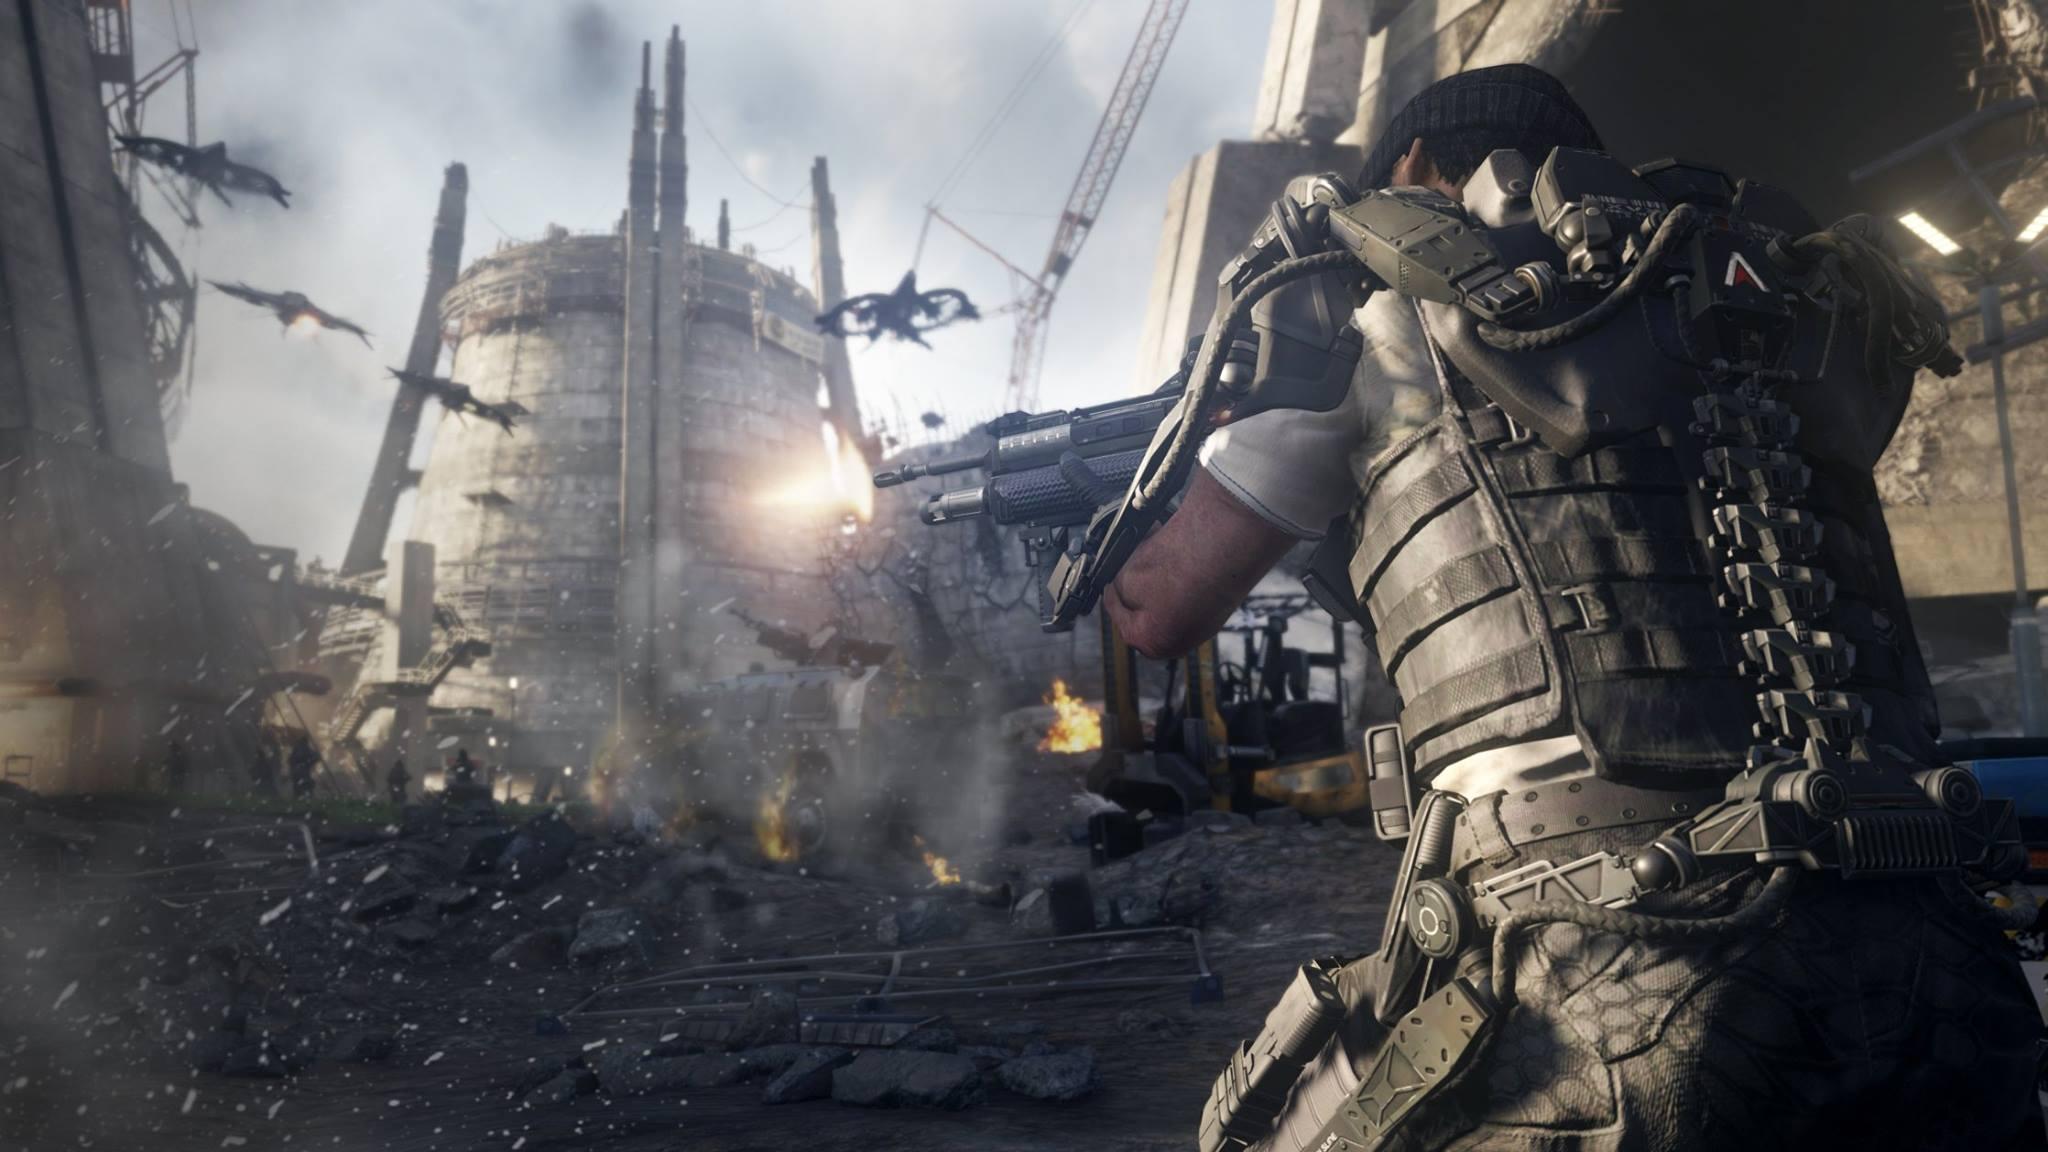 Exoskeleton Call Of Duty Wiki Fandom